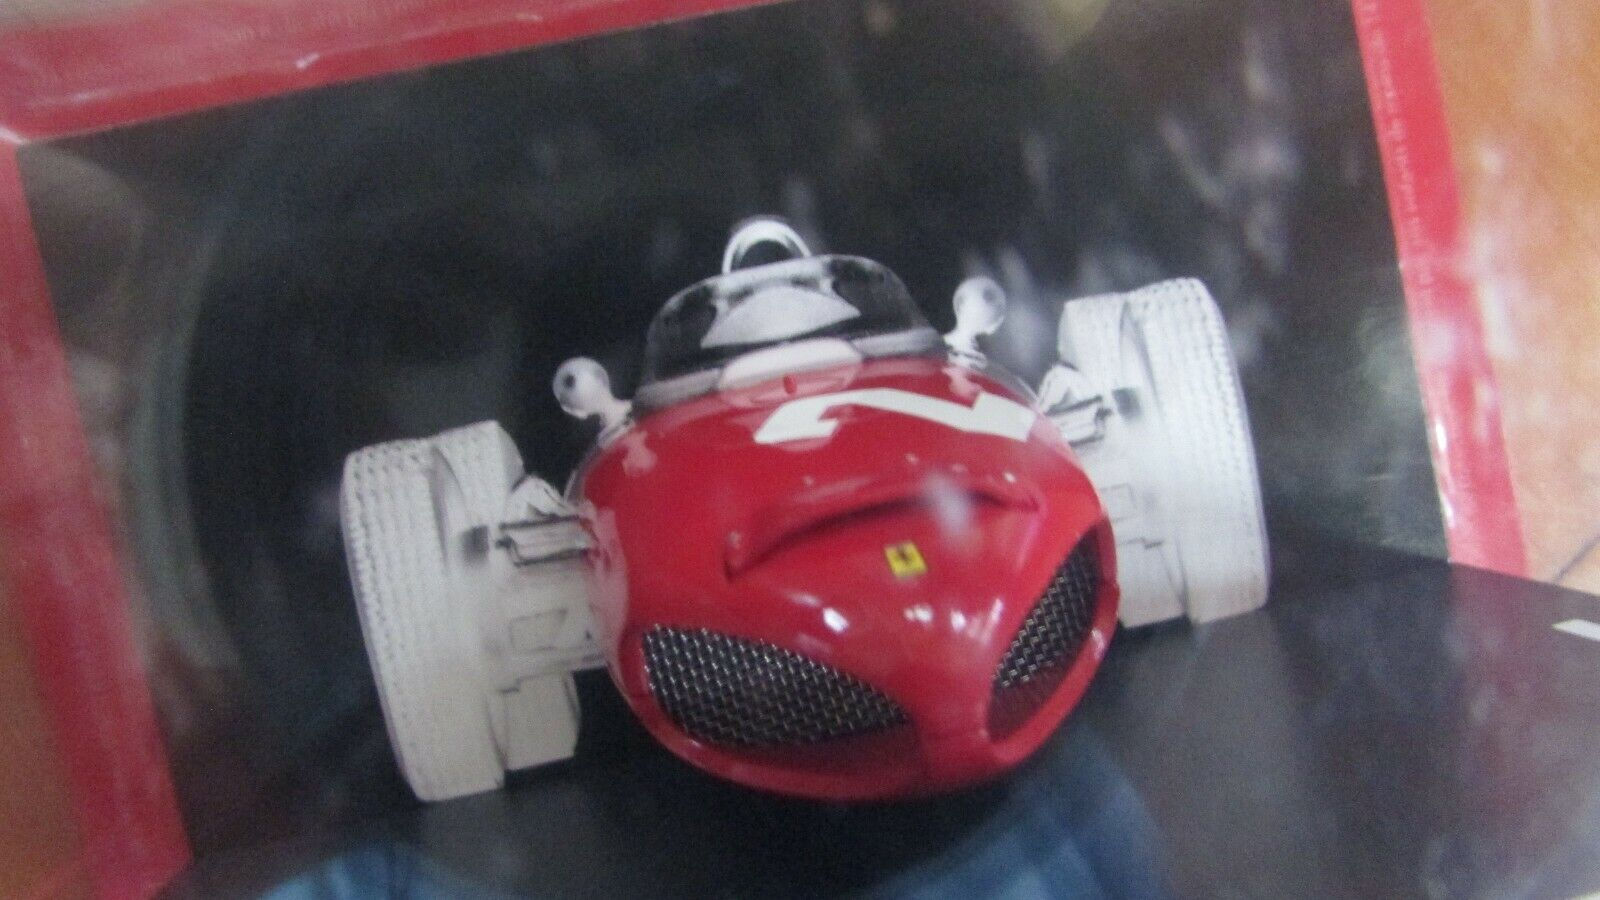 orden ahora disfrutar de gran descuento 1961 Ferrari 156 Race Coche nariz pantalla Phil Phil Phil Hill nuevo caja sin abrir escala 1 18  distribución global